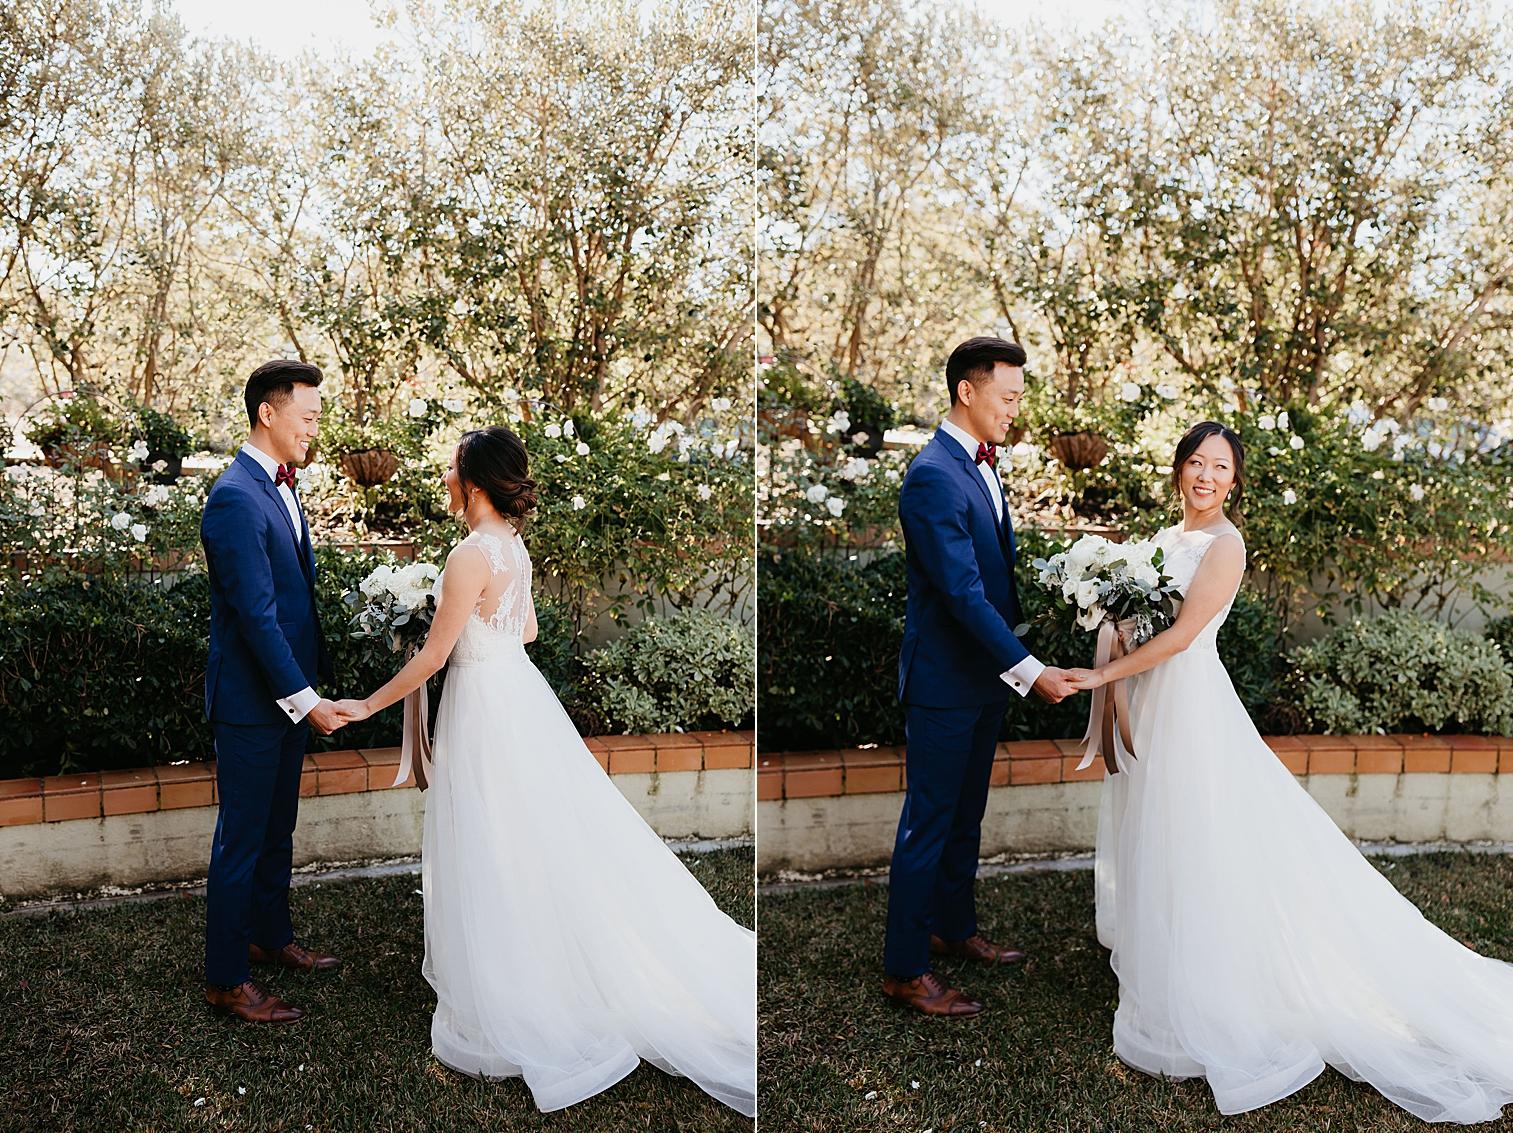 Secret-Garden-Rancho-Santa-Fe-Wedding-29.jpg